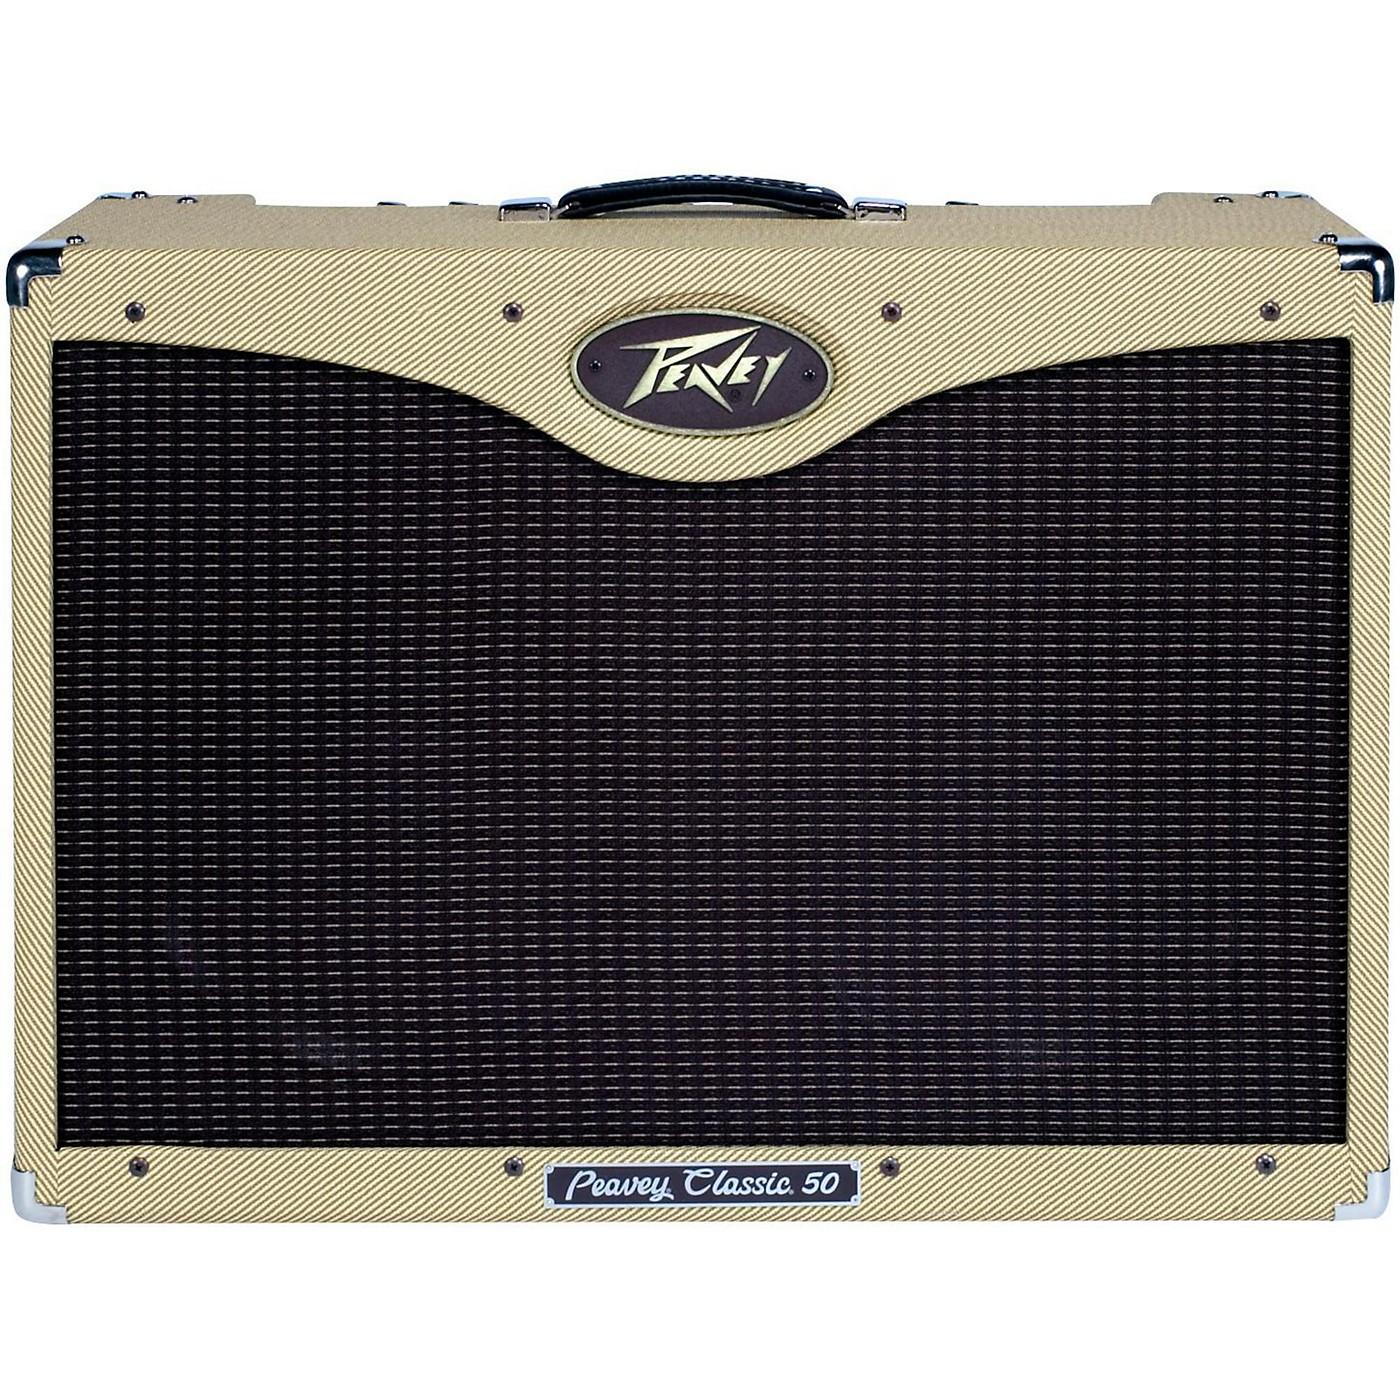 Peavey Classic 50 50W 2x12 Tube Combo Guitar Amp thumbnail